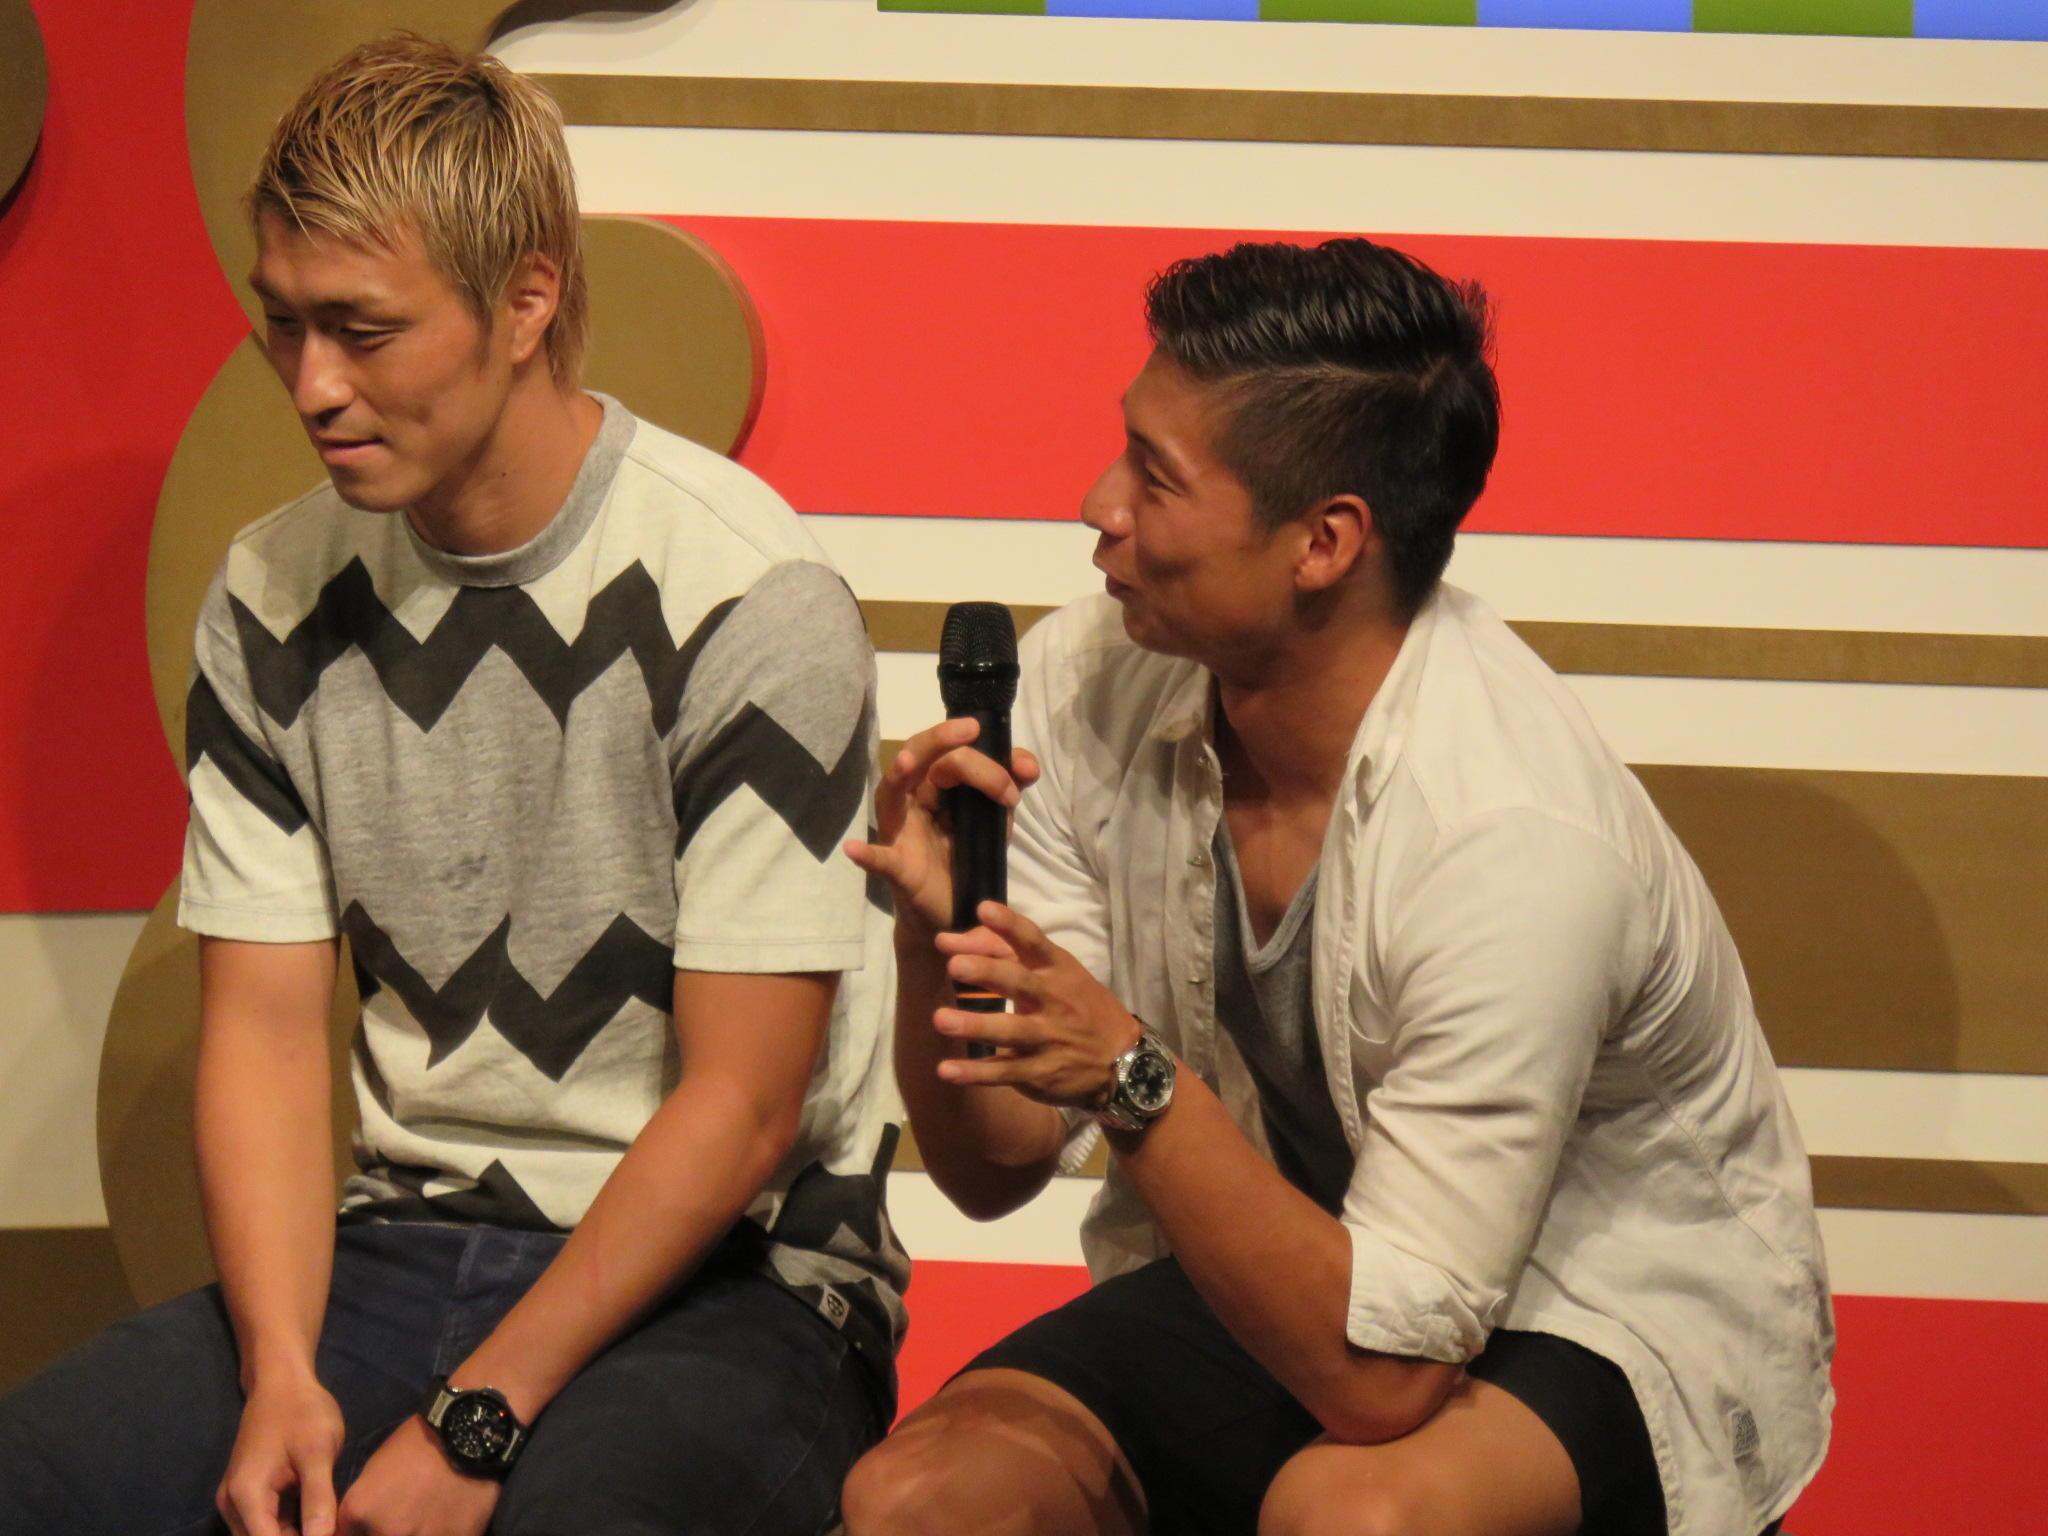 http://news.yoshimoto.co.jp/20160830225920-ce63aa7ecc2922f62e5b2baeccba2aeda38d2e6f.jpg